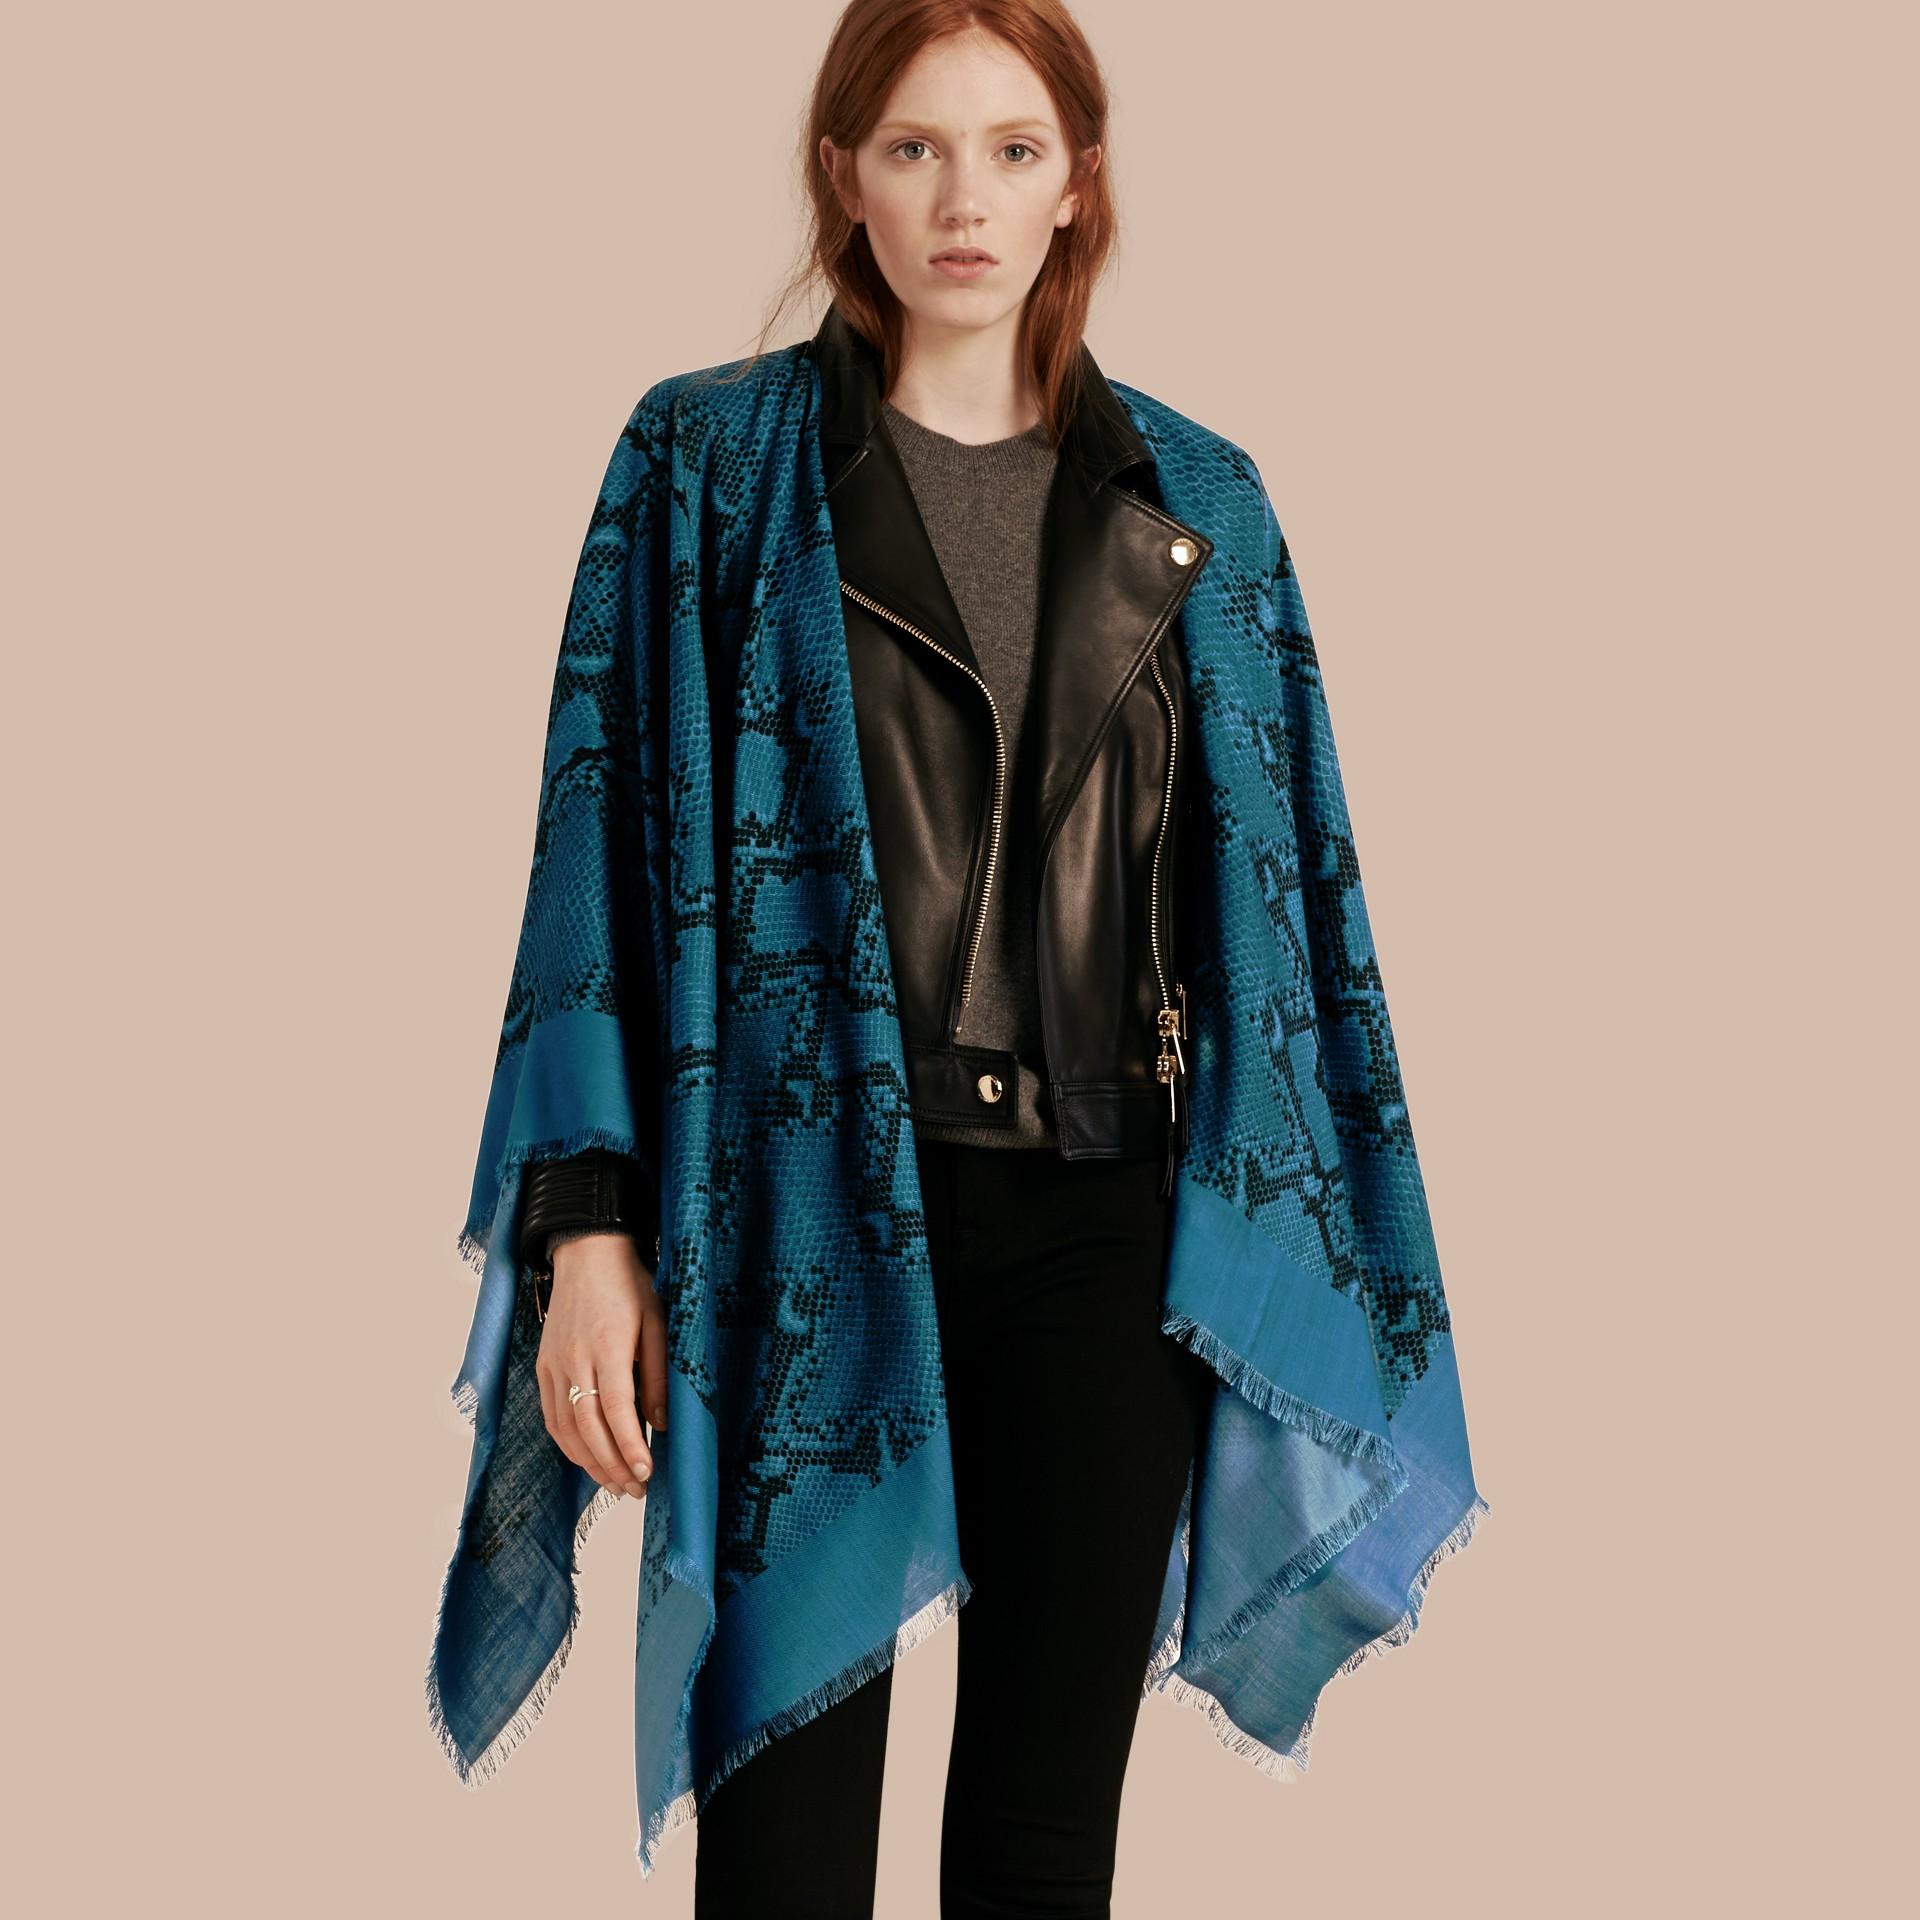 Mineral blue Poncho leve de lã, seda e cashmere com estampa de píton Mineral Blue - galeria de imagens 1